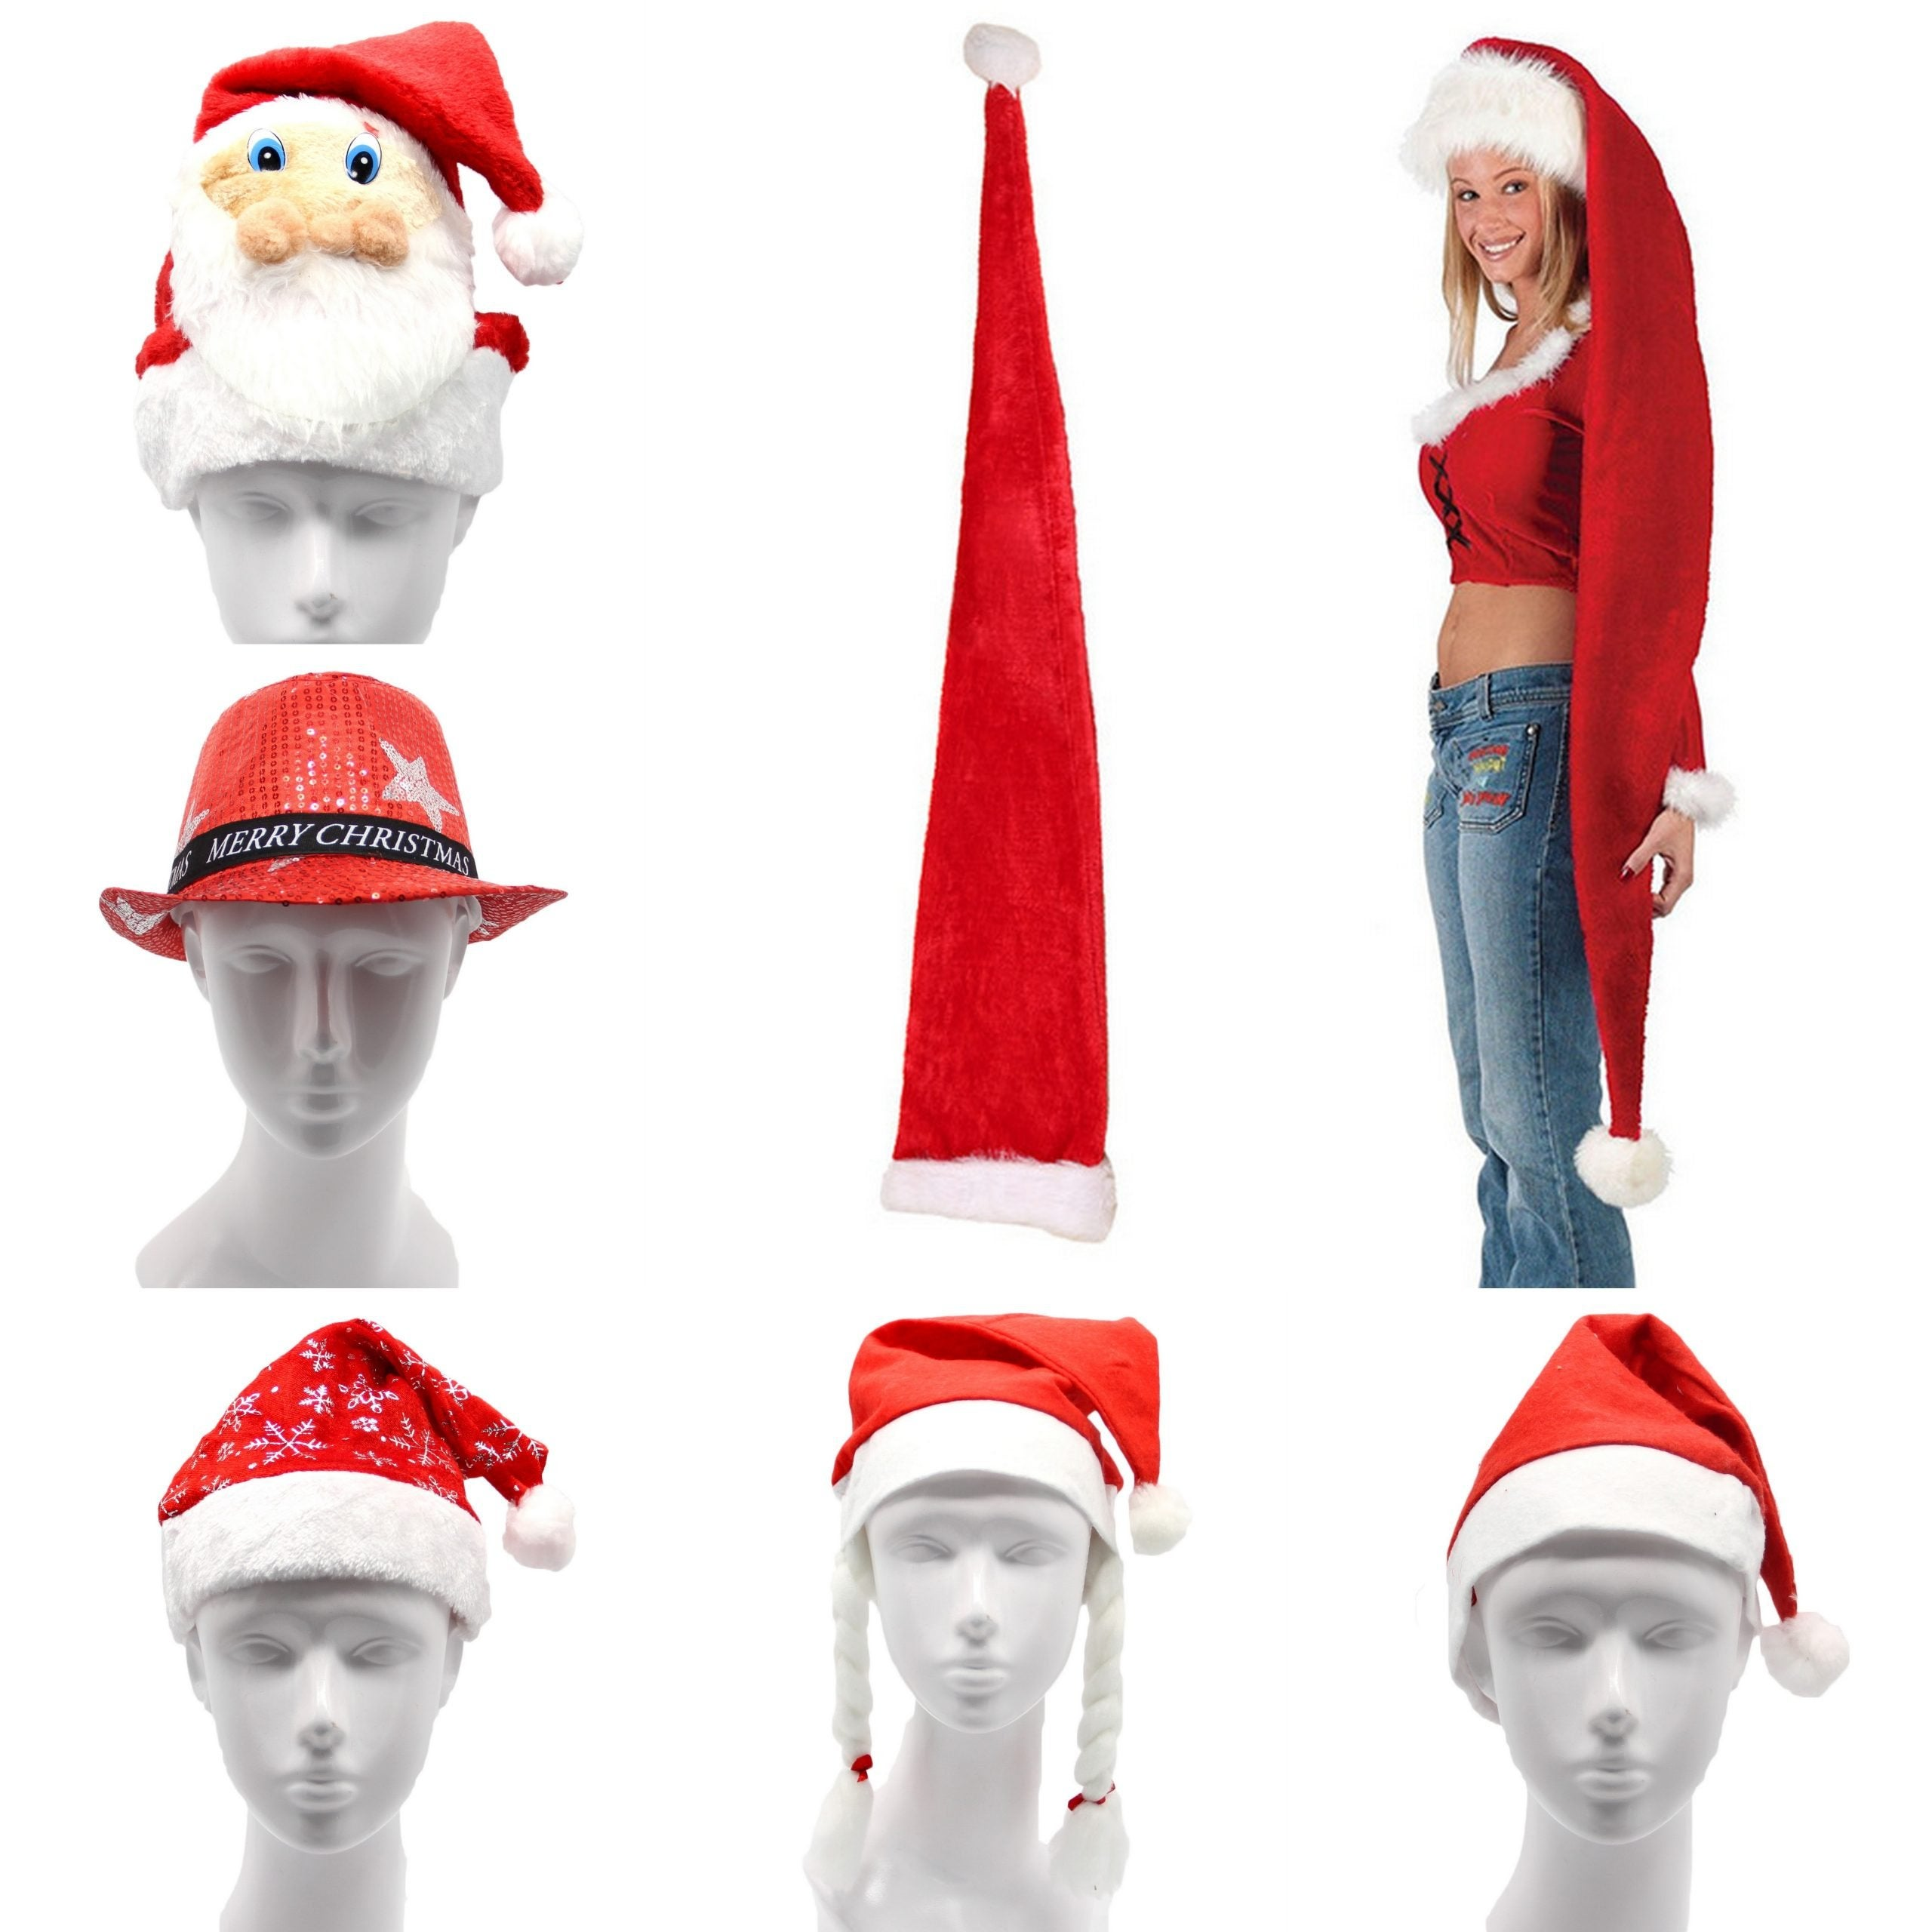 Christmas Unisex Adults Kids Novelty Hat Xmas Party Cap Santa Costume Dress Up